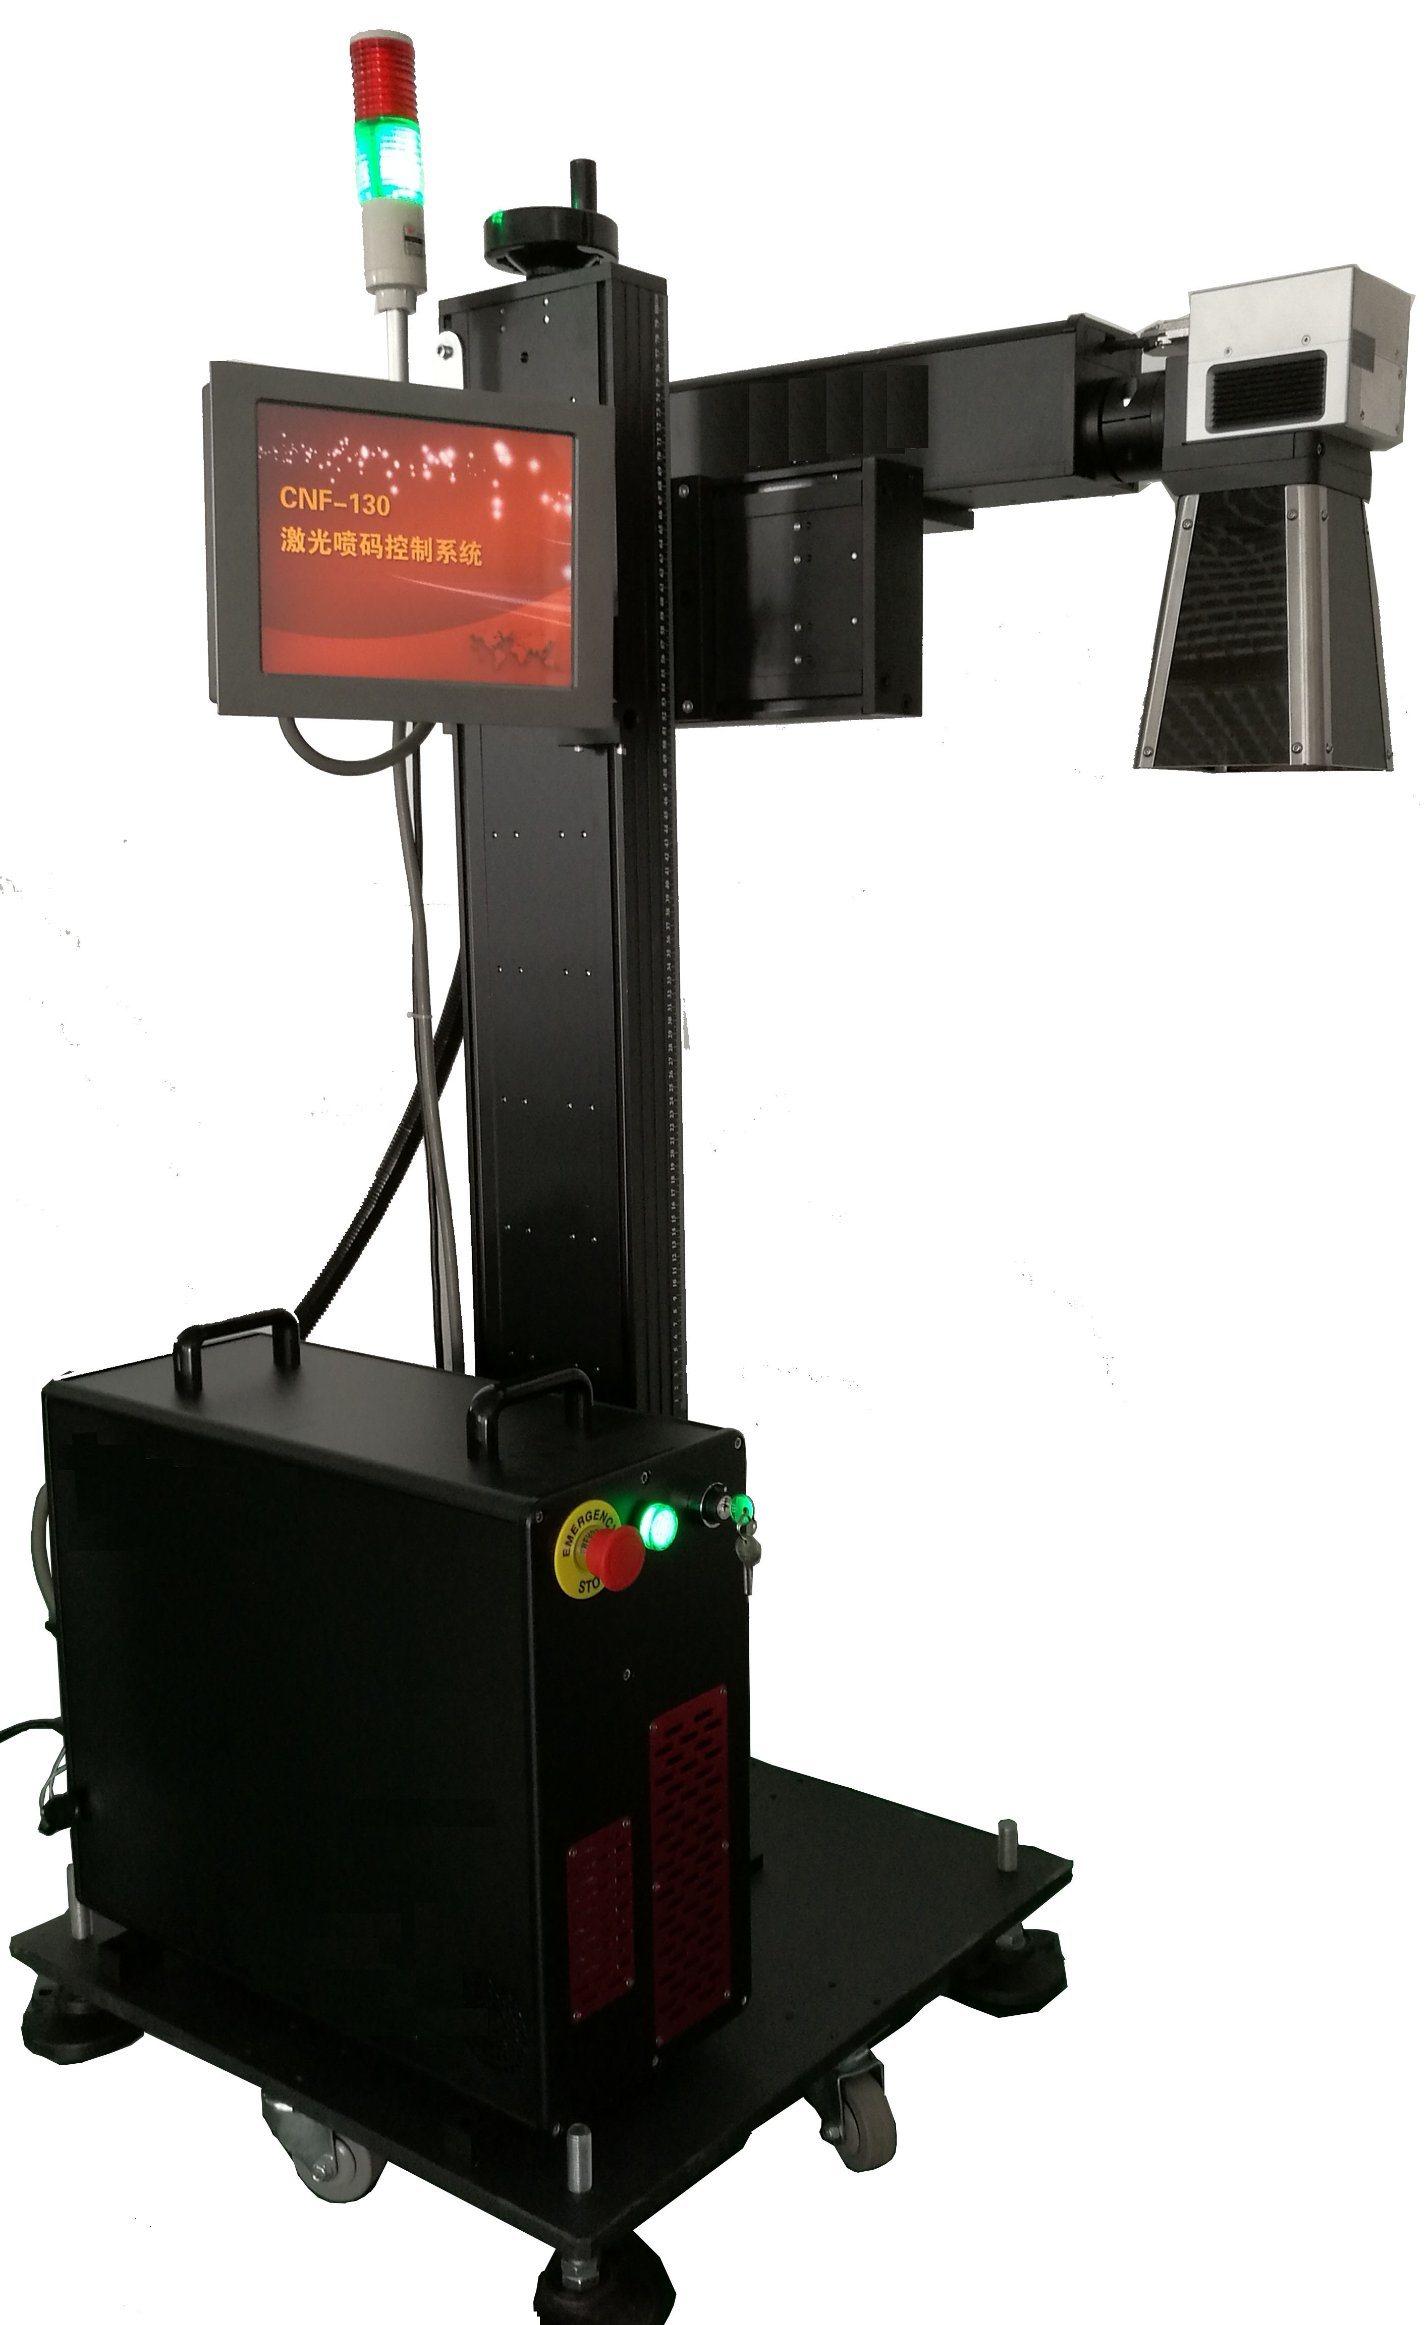 30W Ylpf-30b Fiber Laser Marker for PP/PVC/PE/HDPE Plastic Pipe, Fittings Non Metal